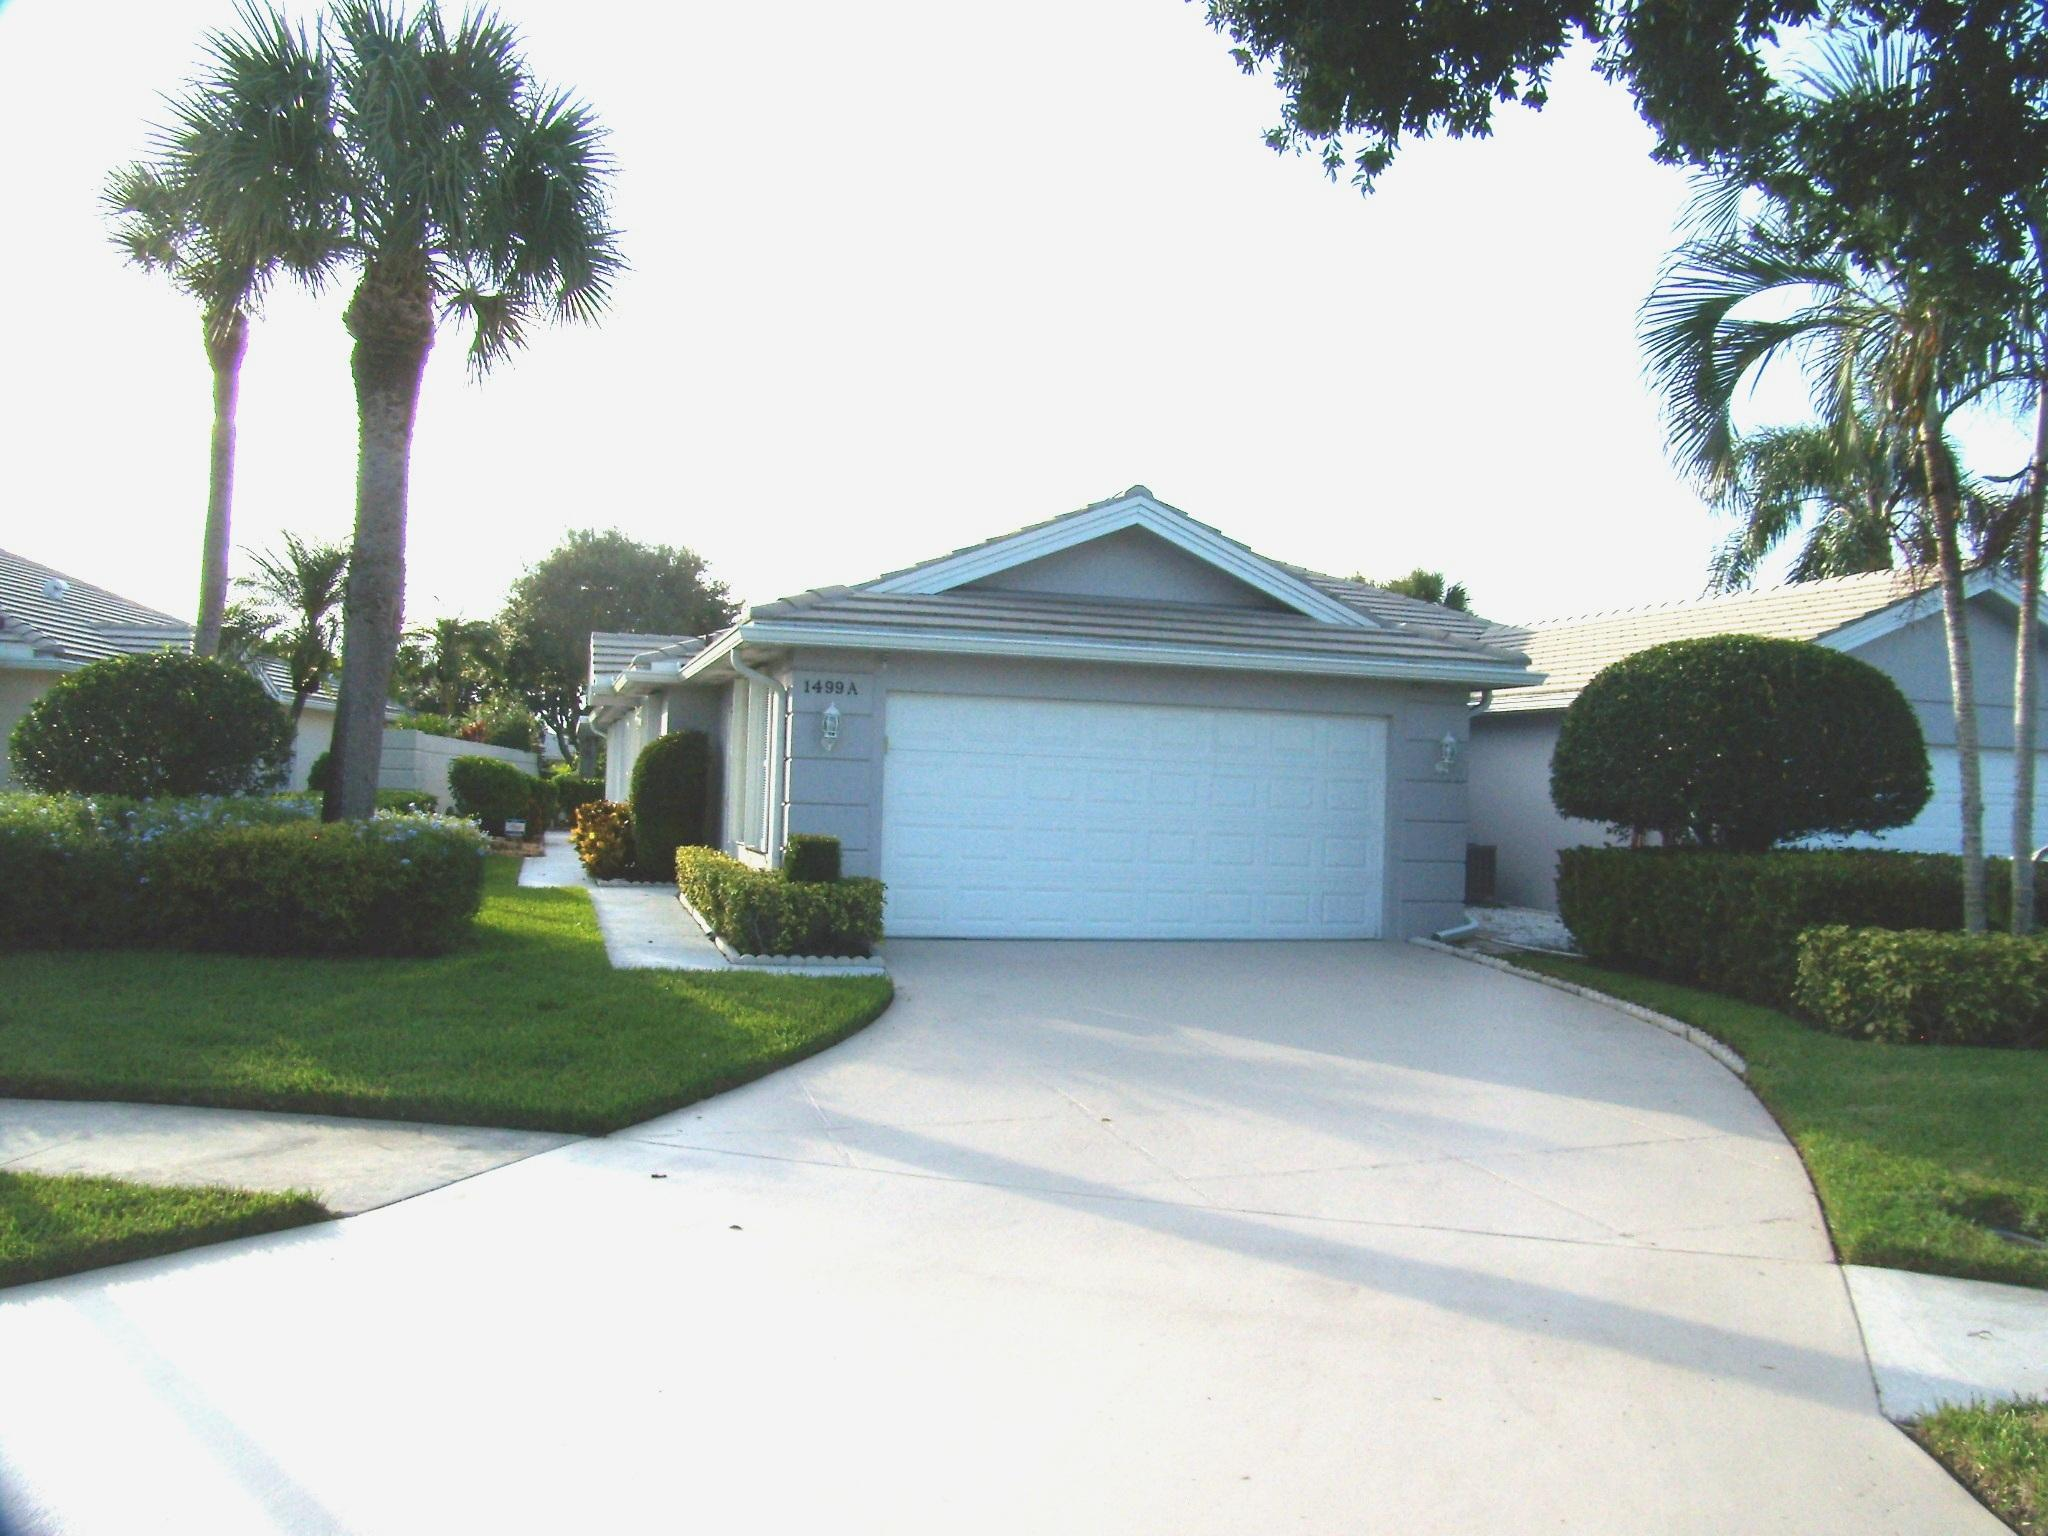 1499 Nw Amherst Drive, Port Saint Lucie, FL 34986